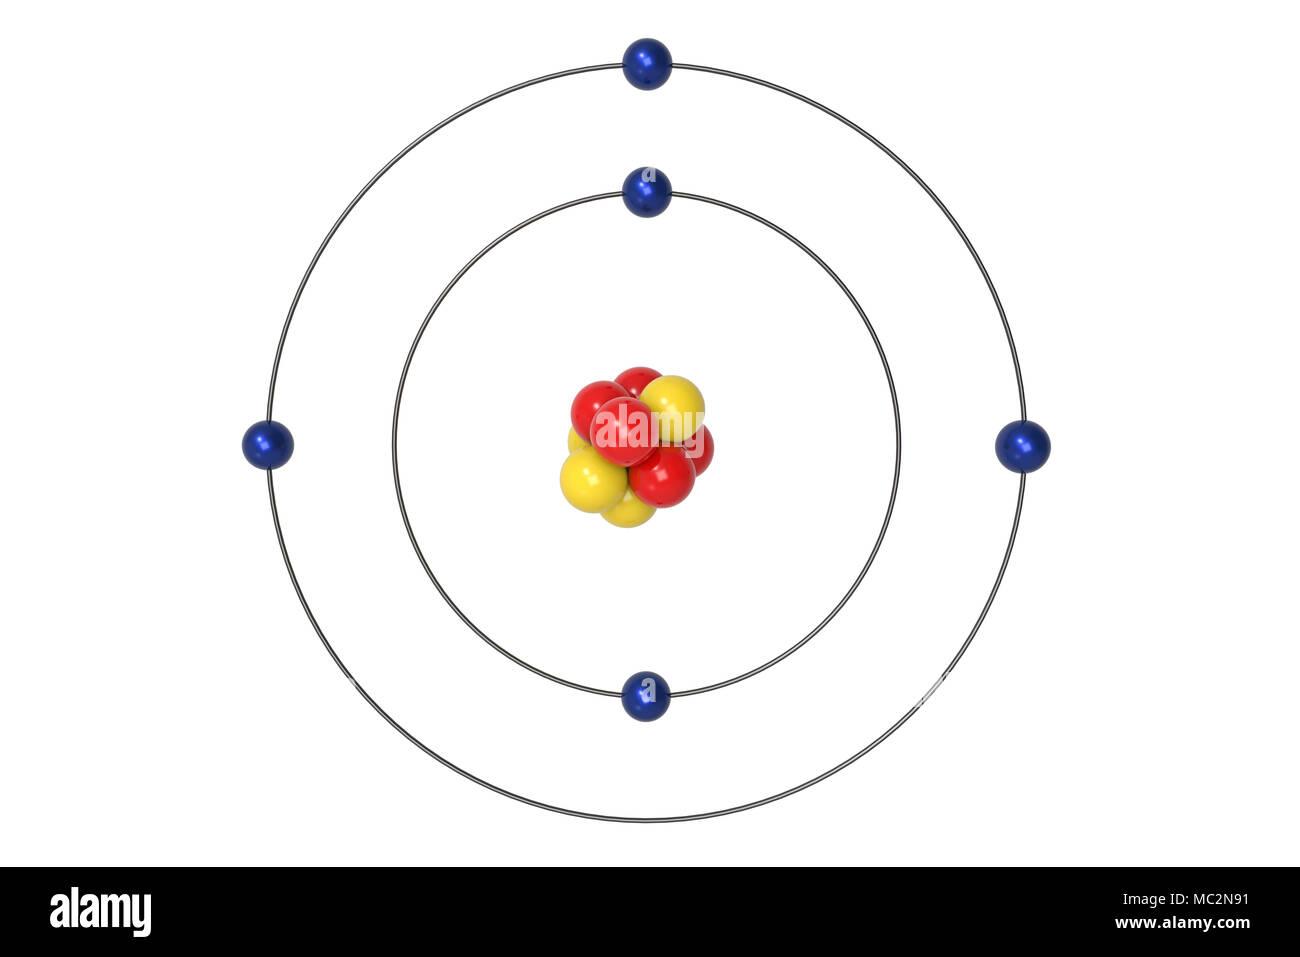 Boron element stock photos boron element stock images alamy boron atom bohr model with proton neutron and electron 3d illustration stock image ccuart Images